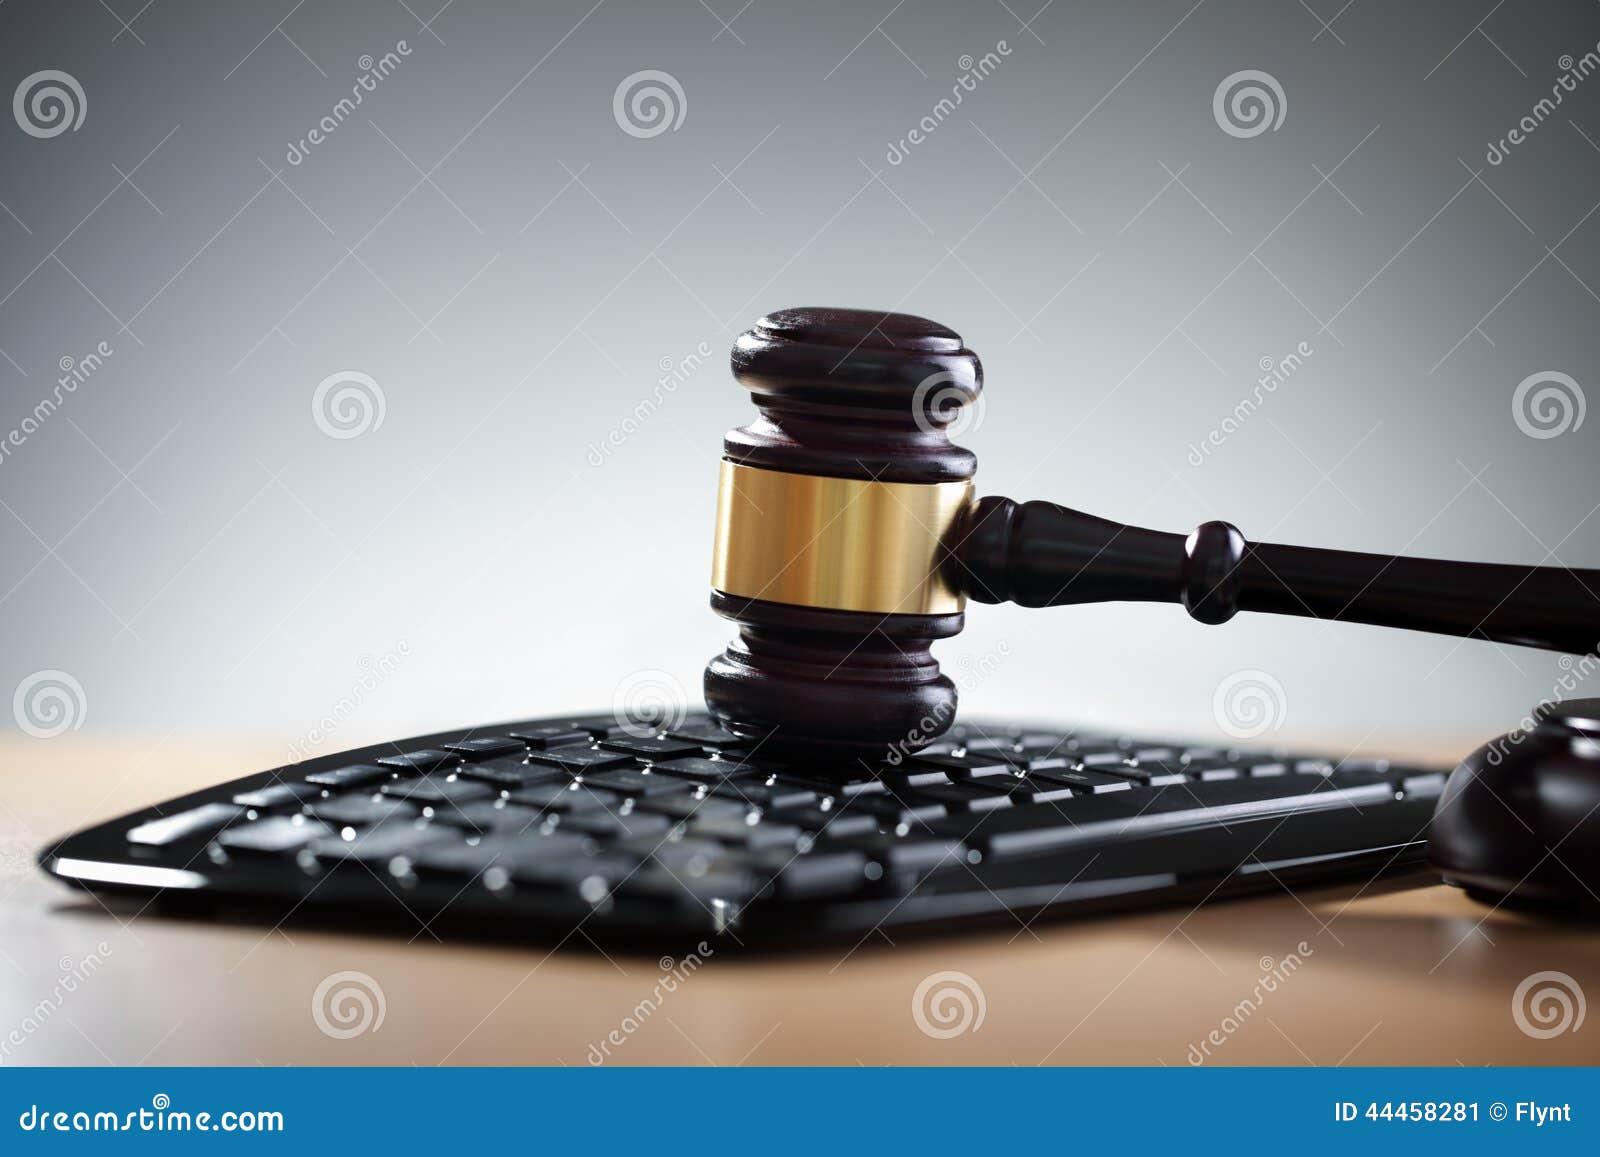 Rechtvaardigheidshamer en computertoetsenbord